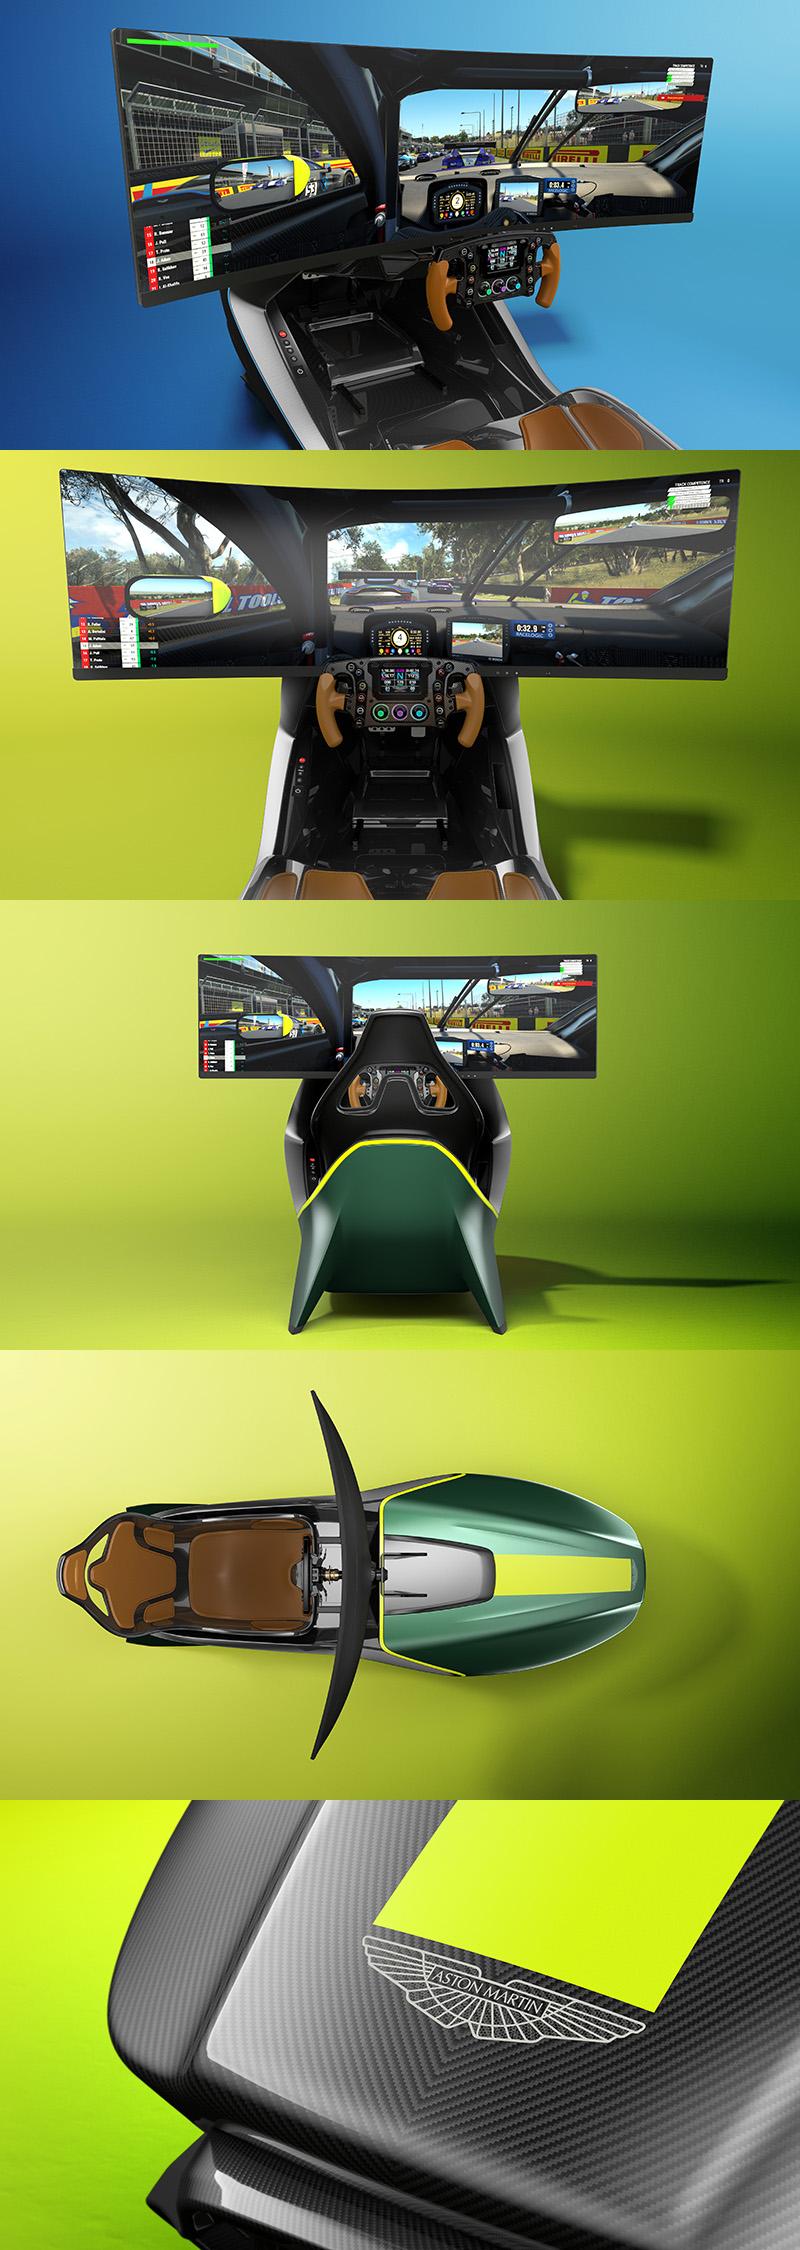 AMR-C01 Racing Simulator同樣充滿著Aston Martin的設計元素。